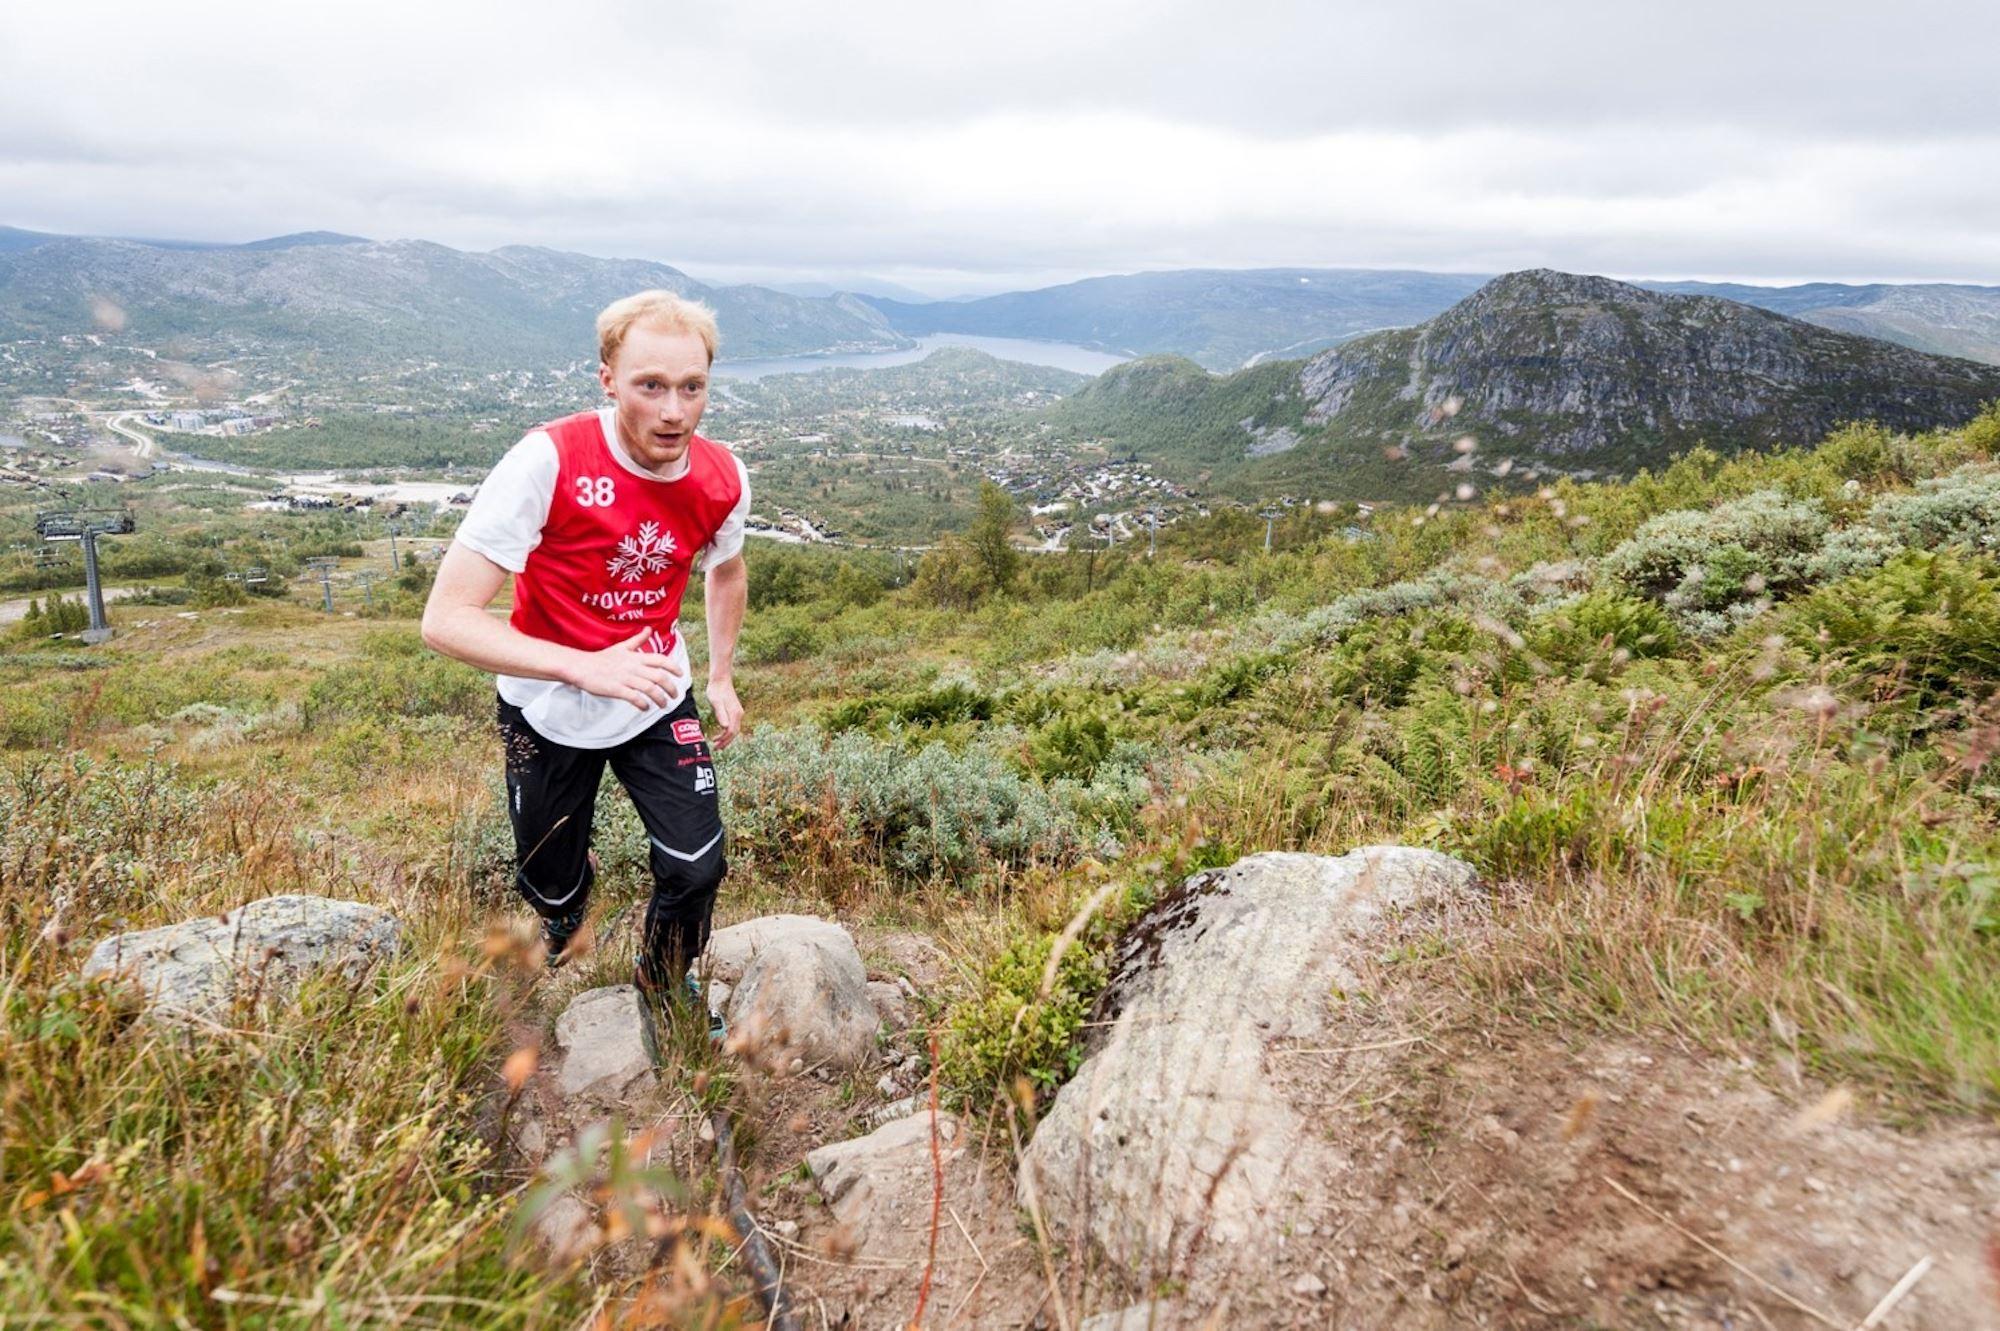 Ti topps 2017 - Bakkeløp